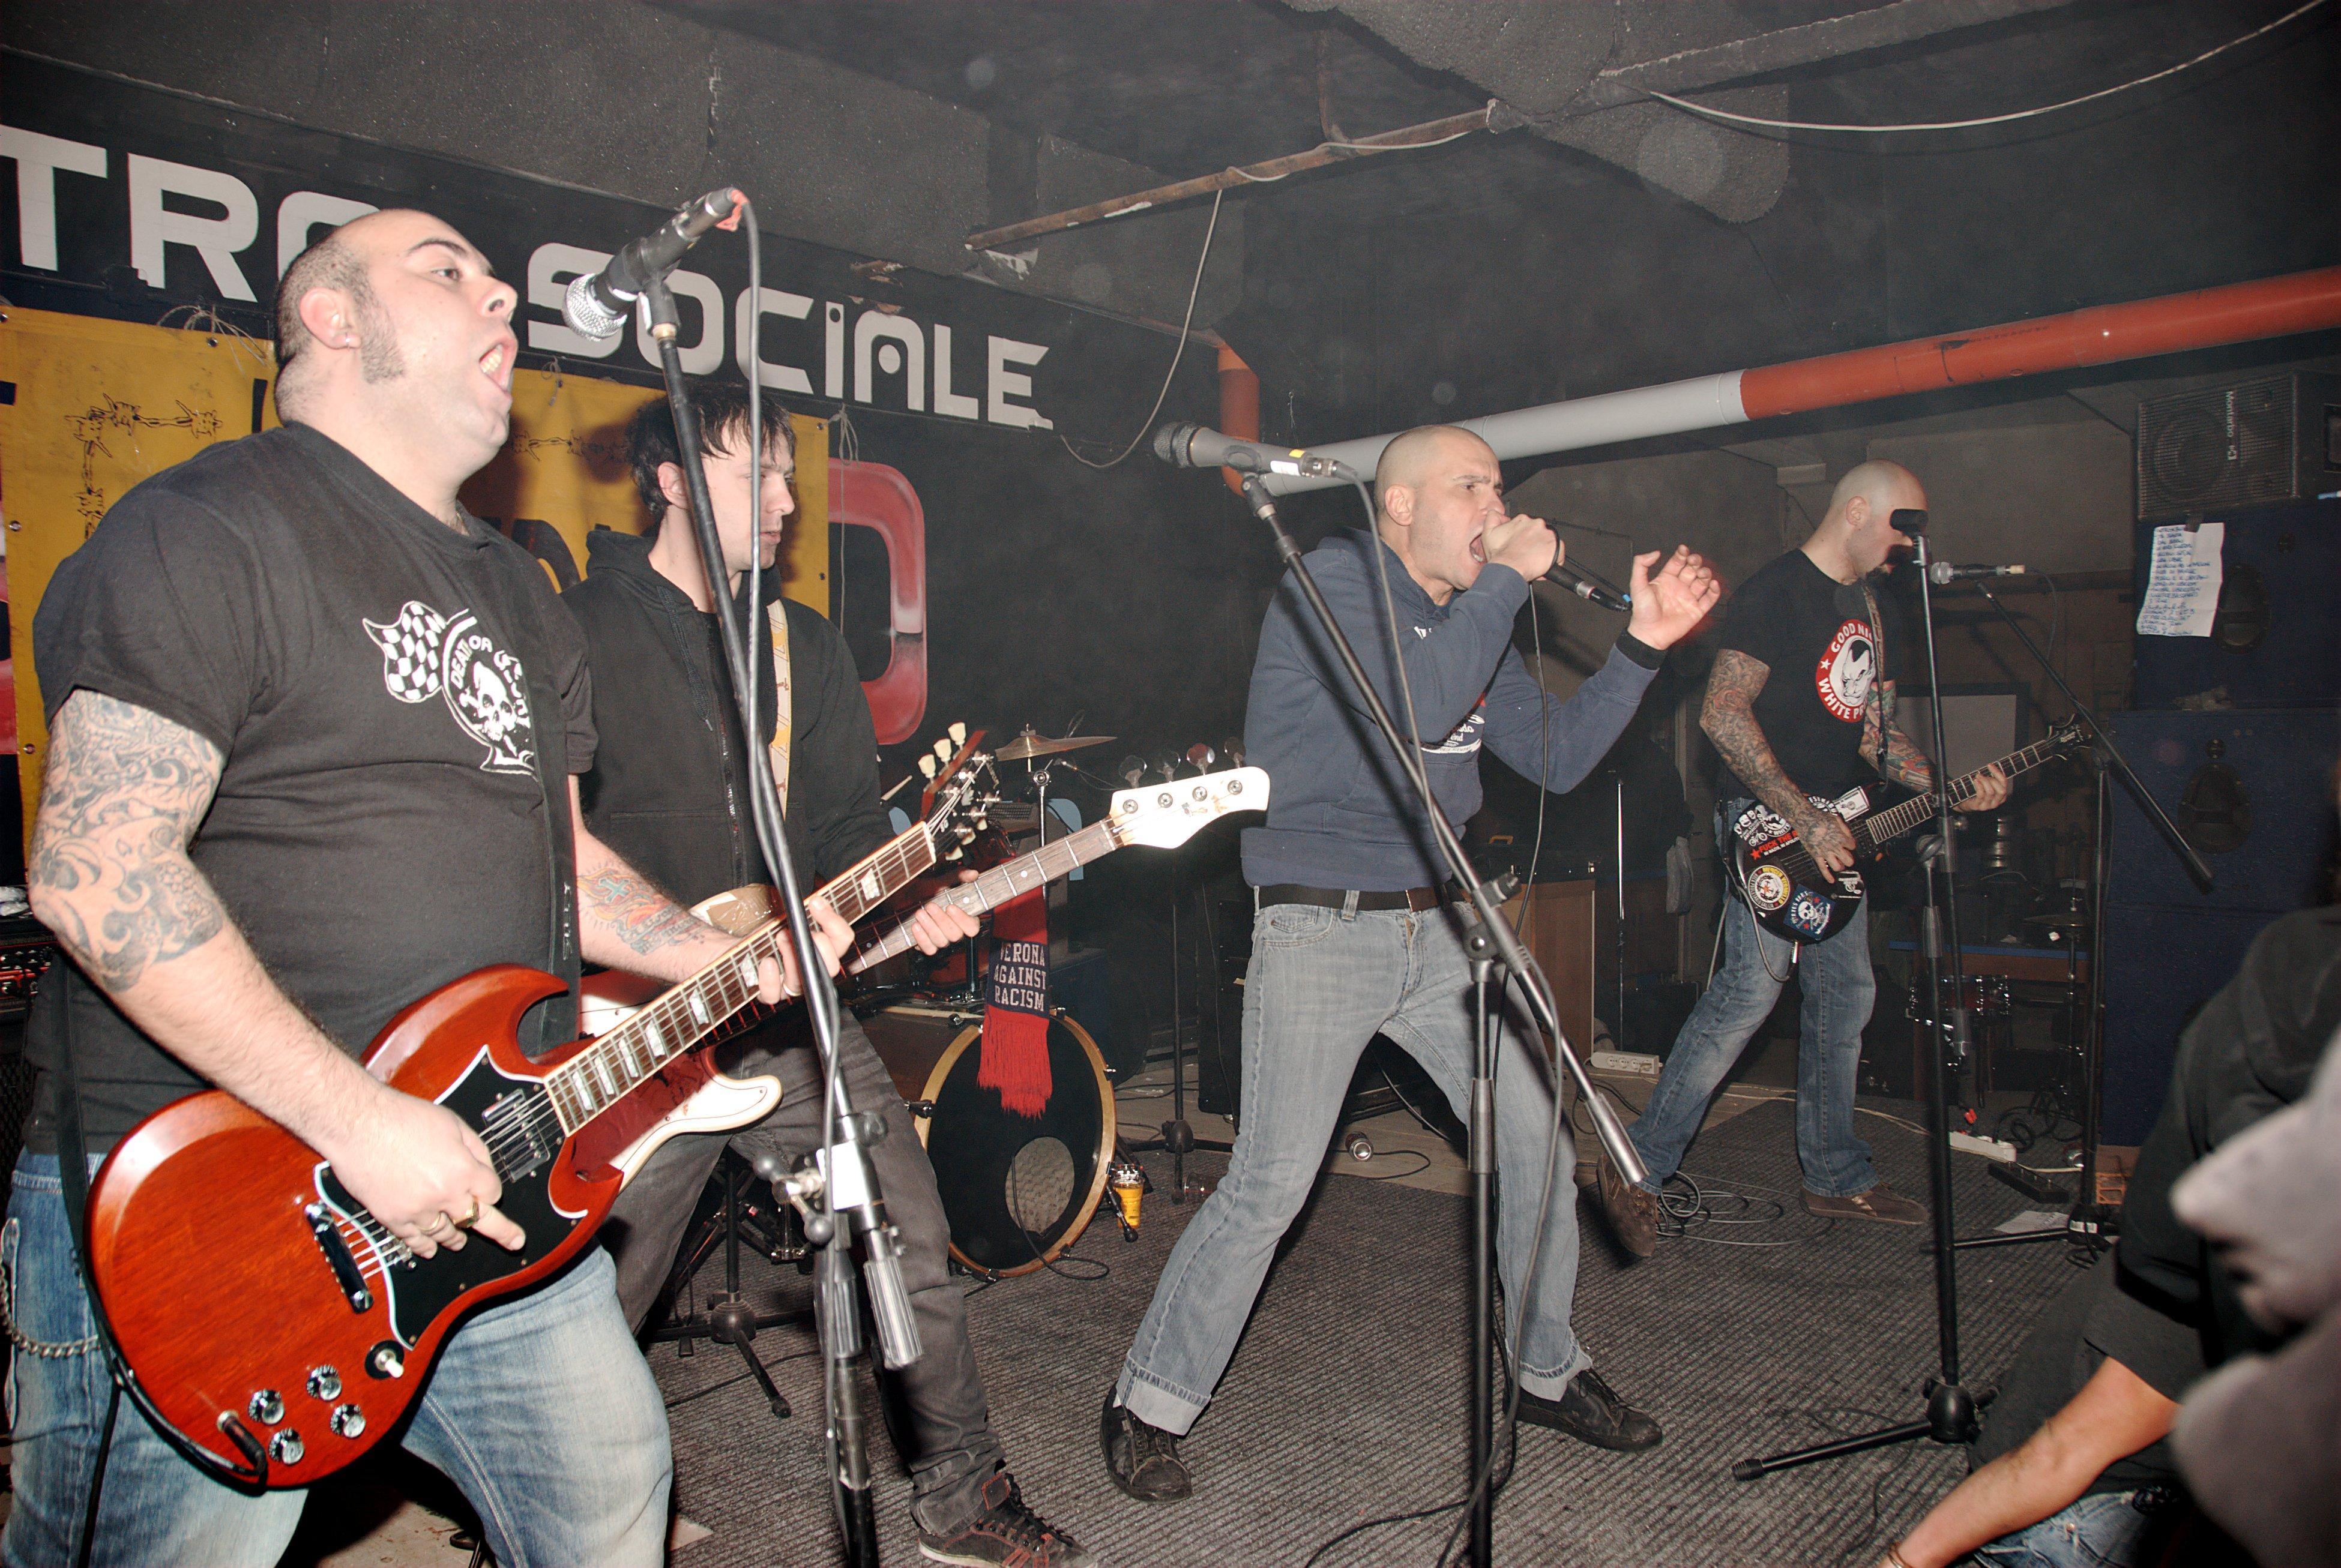 Los Fastidios Fetter Skinhead In 2007